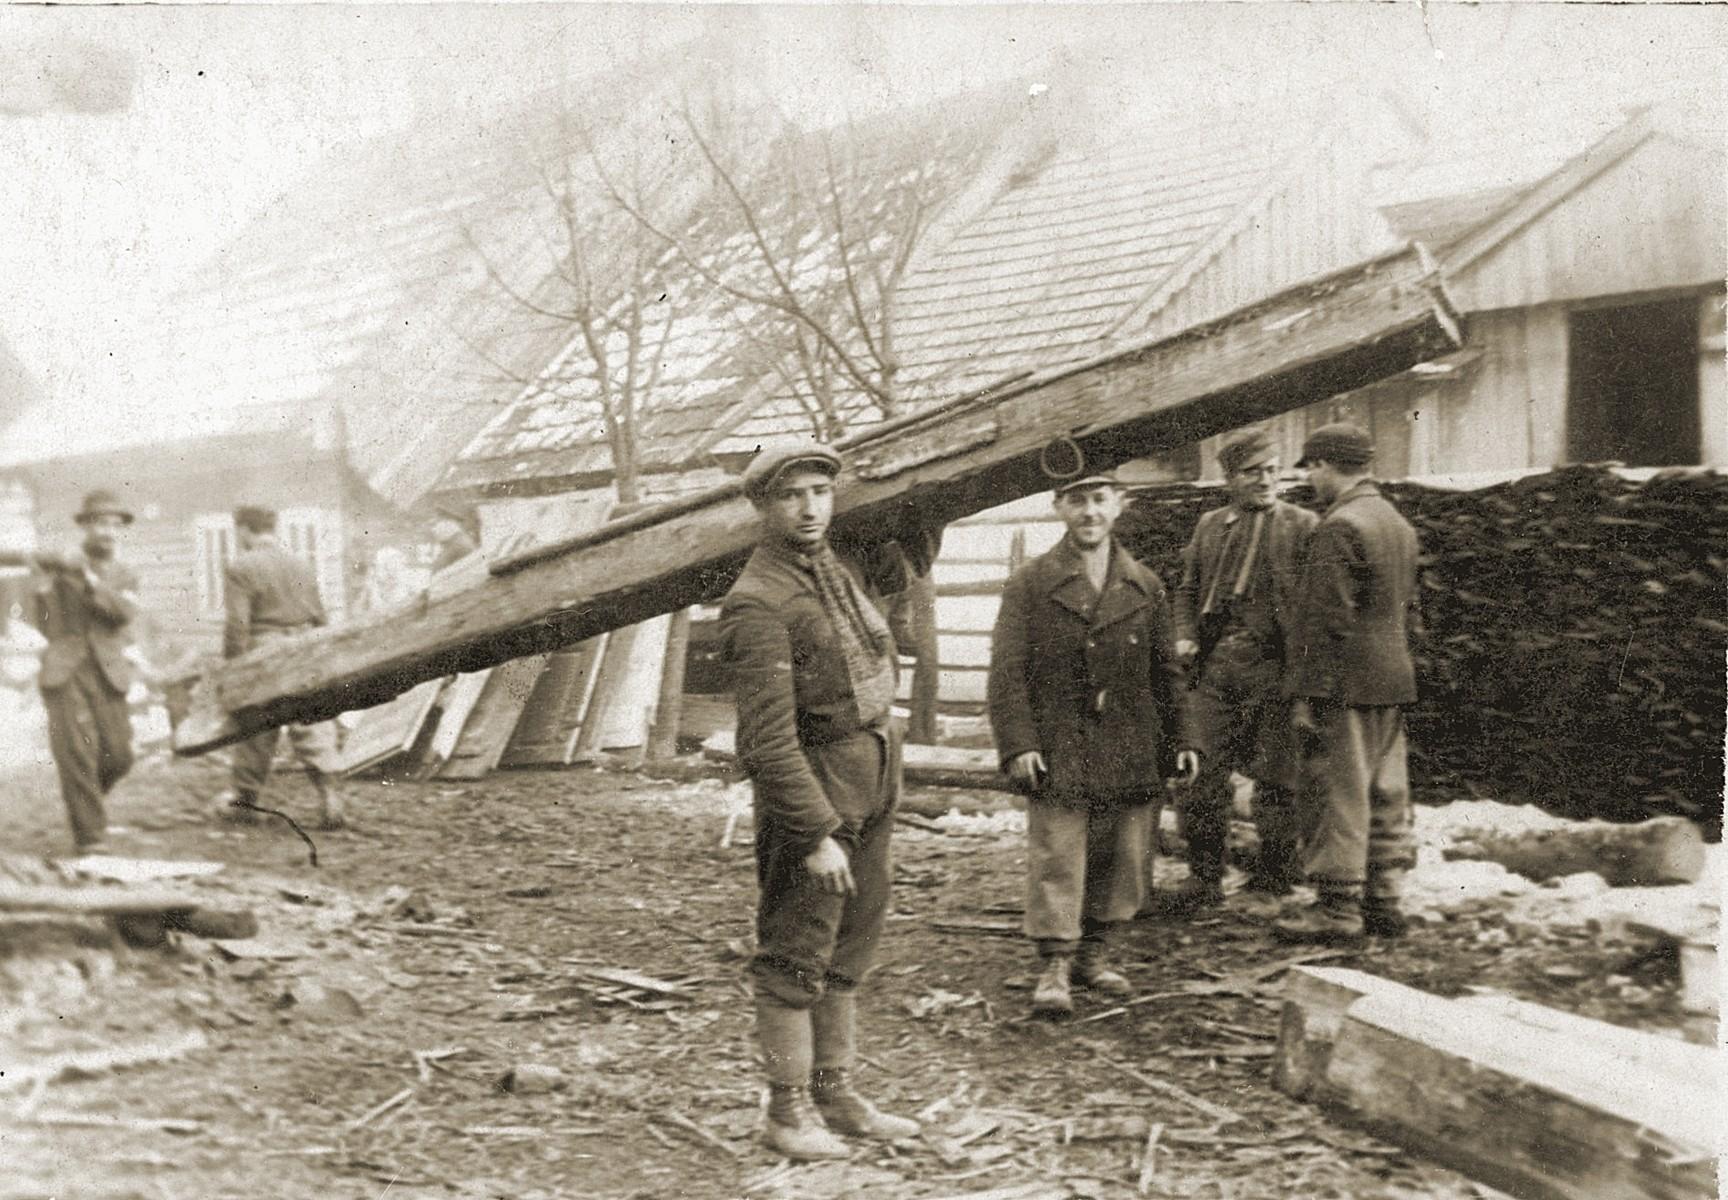 Jewish men, originally from Bedzin, work in the lumberyard of a German labor camp.